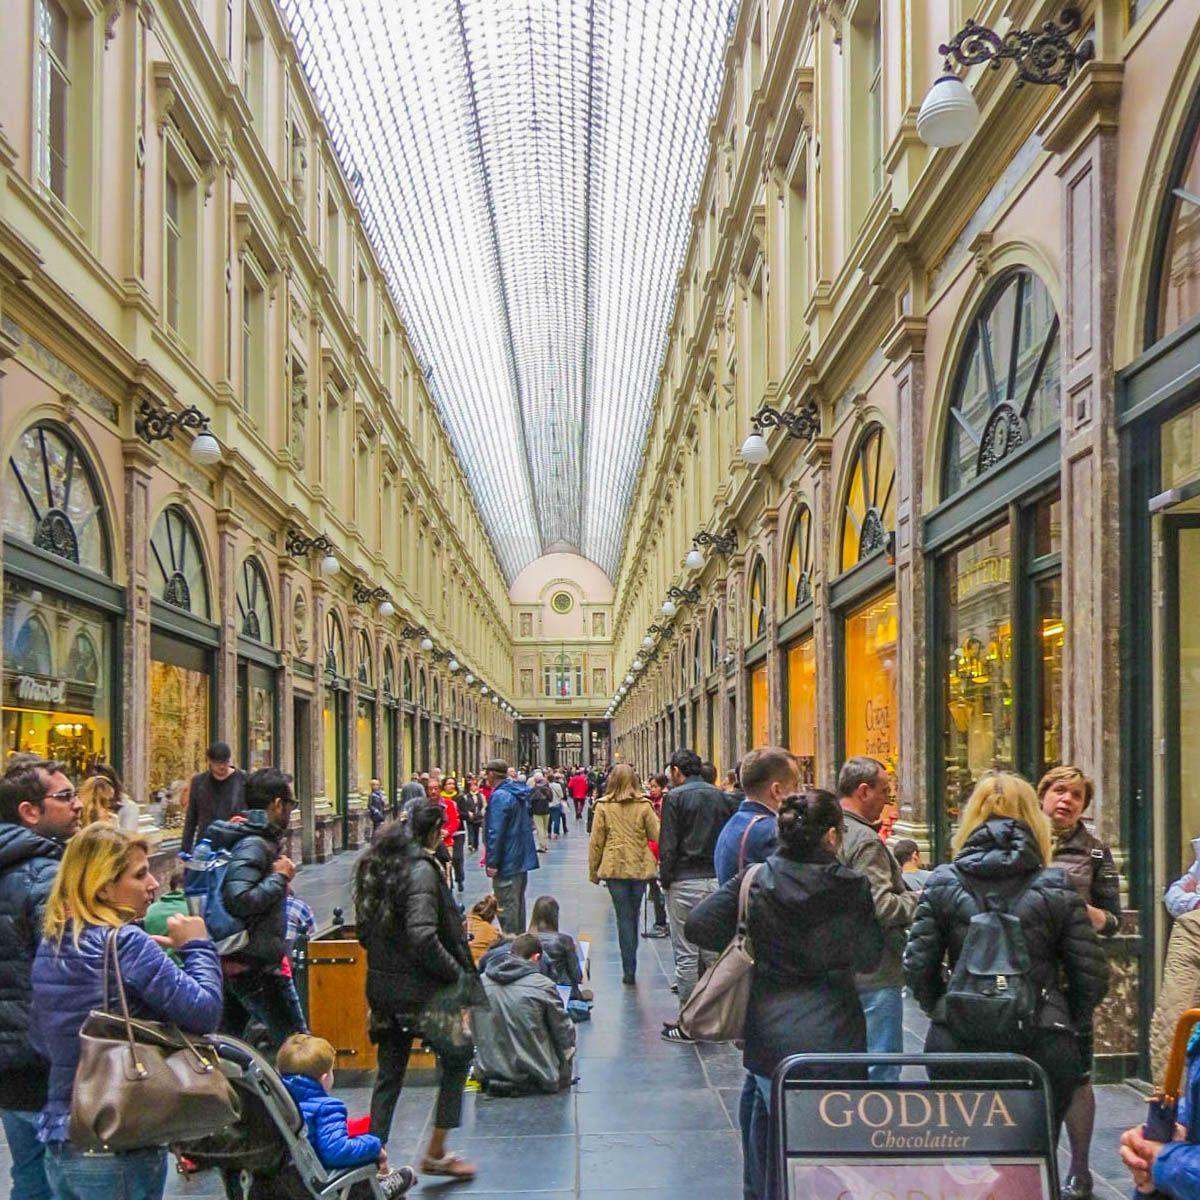 Les Galeries Royales Saint Hubert City Of Brussels Kingdom Of Belgium Photo By Mike Keenan Read Articles At Www Whattravelwiters Saint Hubert Belgium Photo